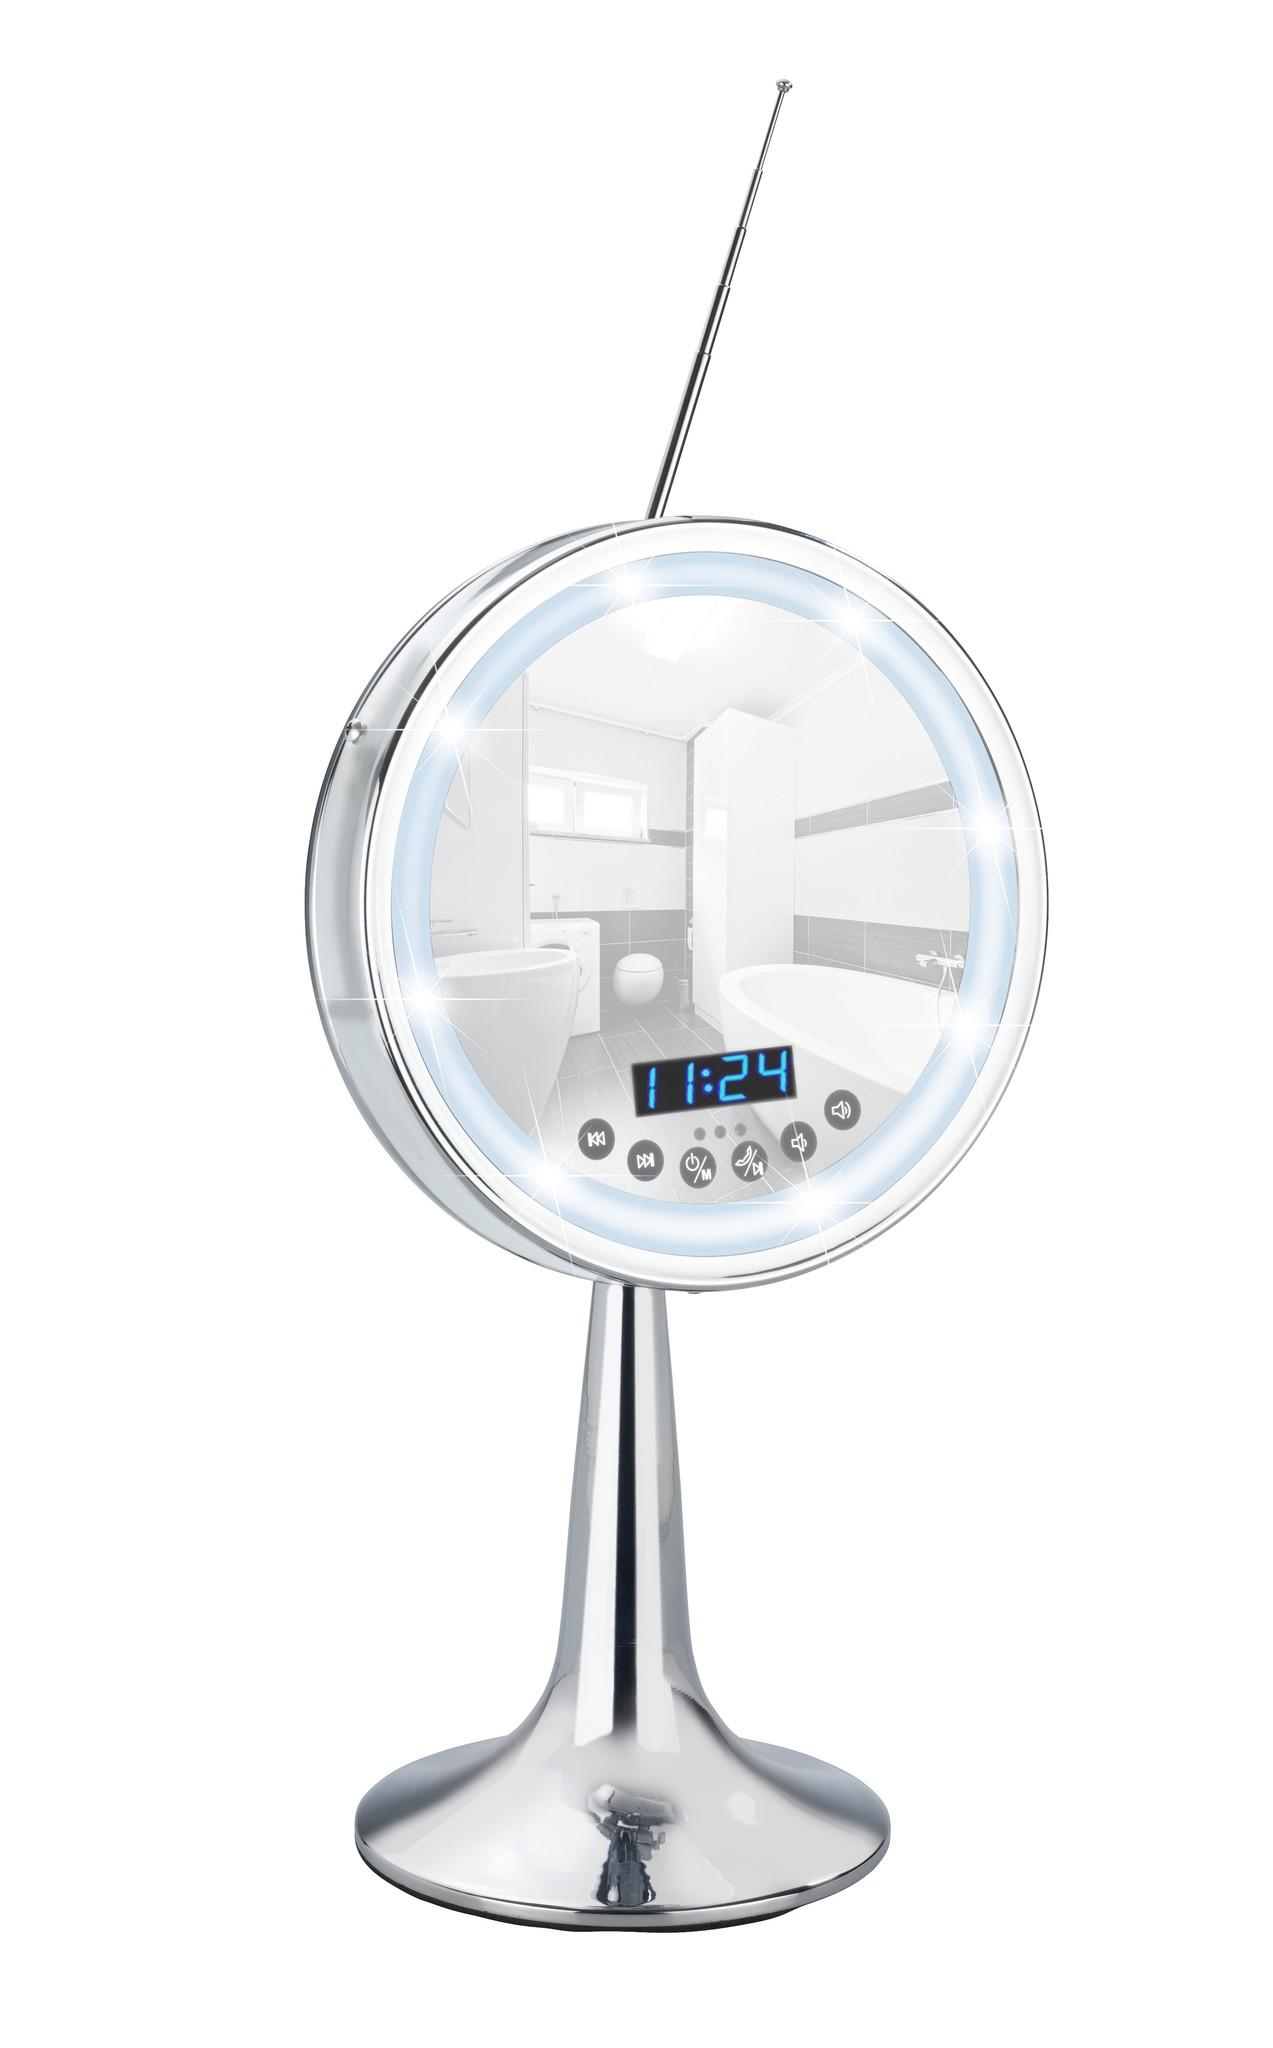 LED Kosmetik-Standspiegel Imperial, 3-fach Vergrößerung, mit Bluetooth Funktion, USB-Port, Mikrofon